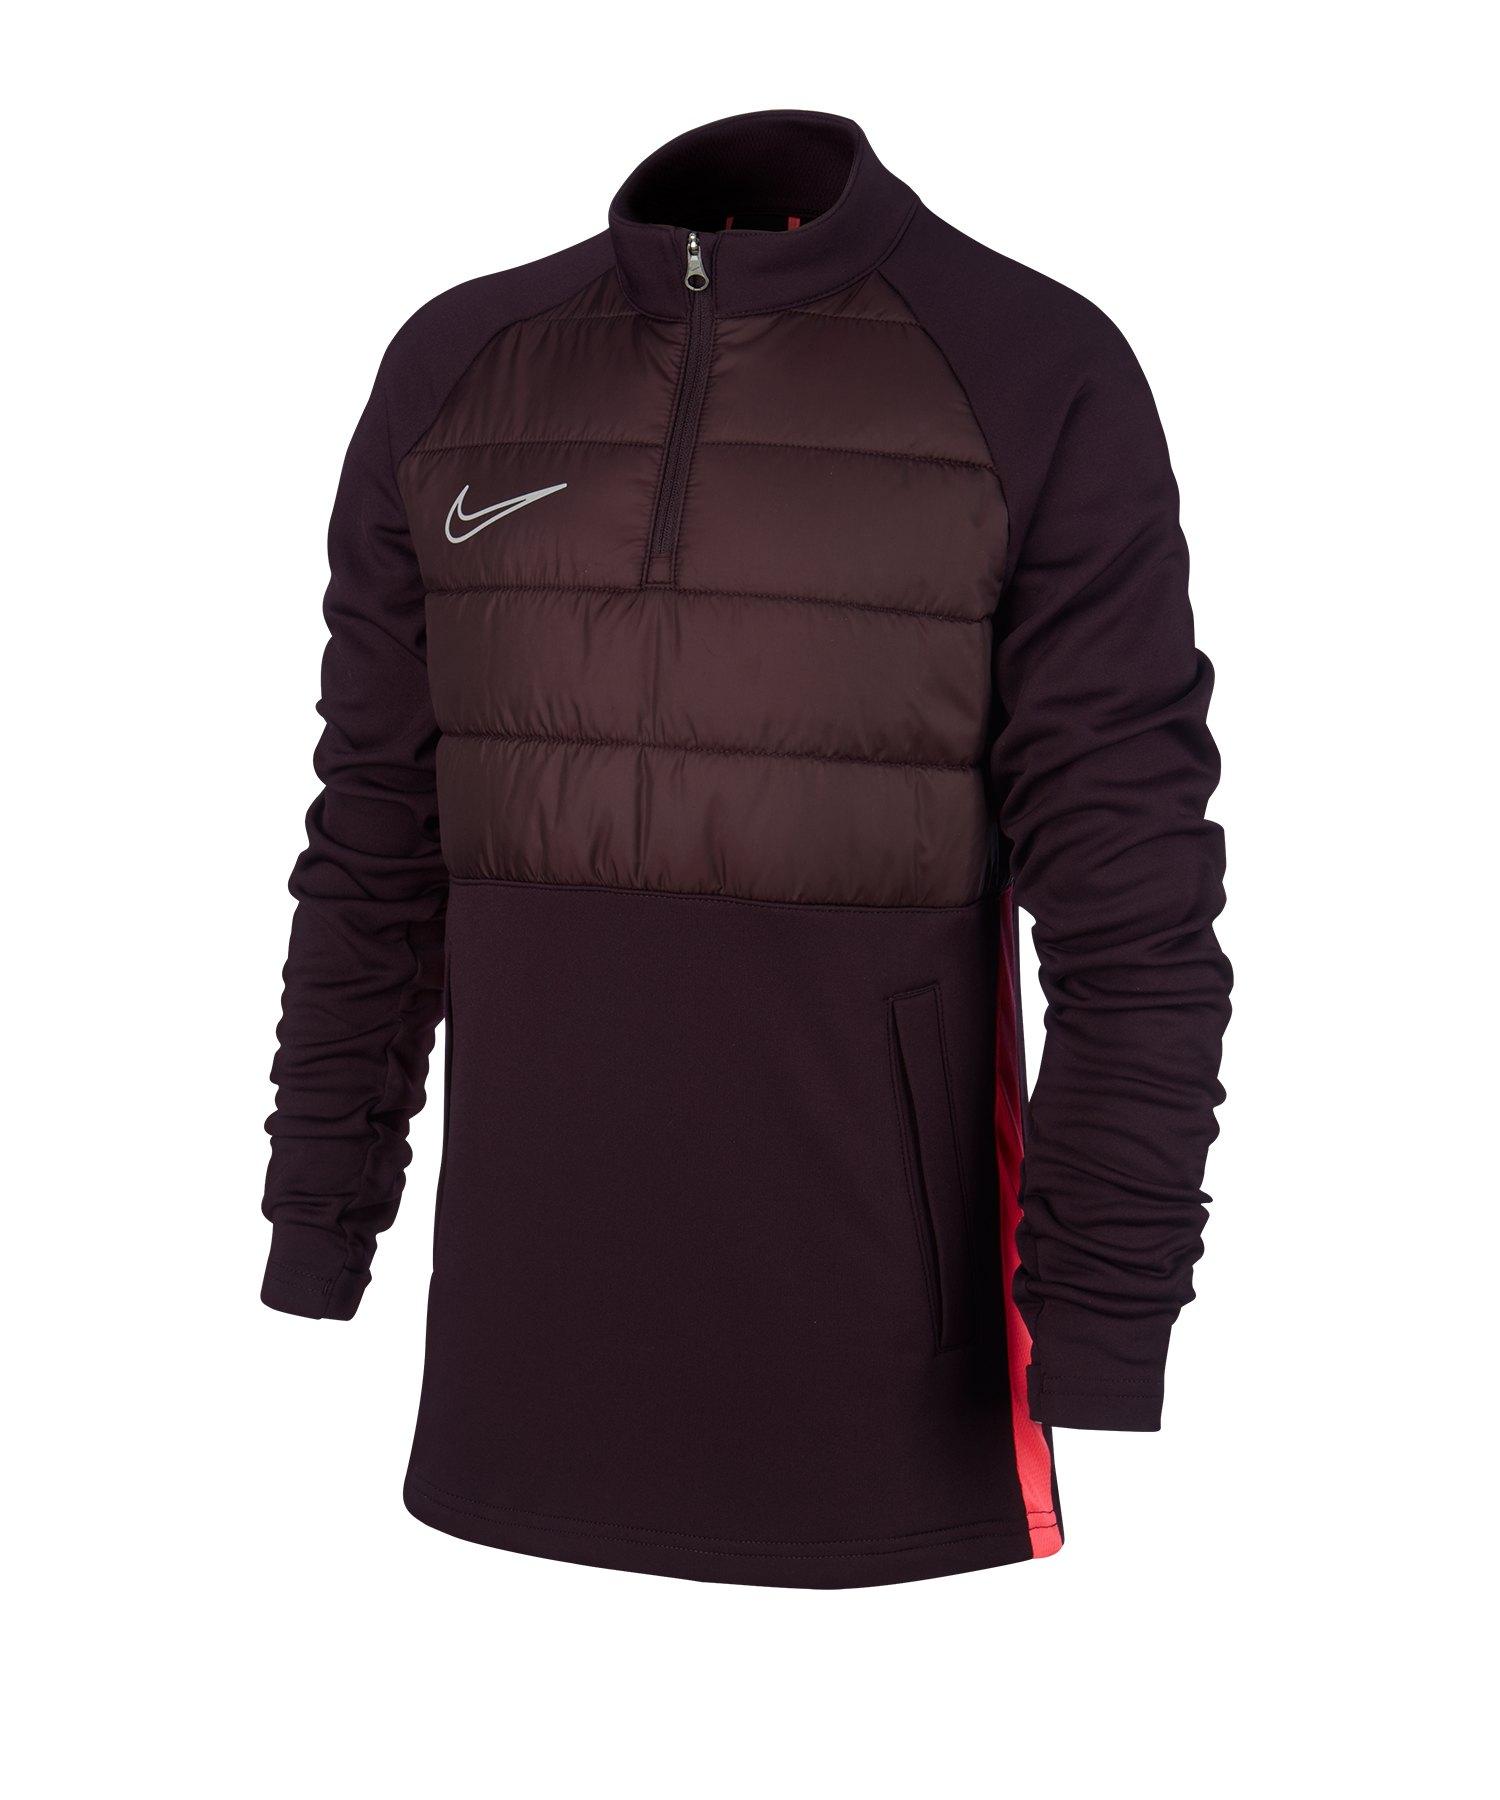 Nike Dri-FIT Academy 1/4 Zip Sweatshirt Kids F659 - rot